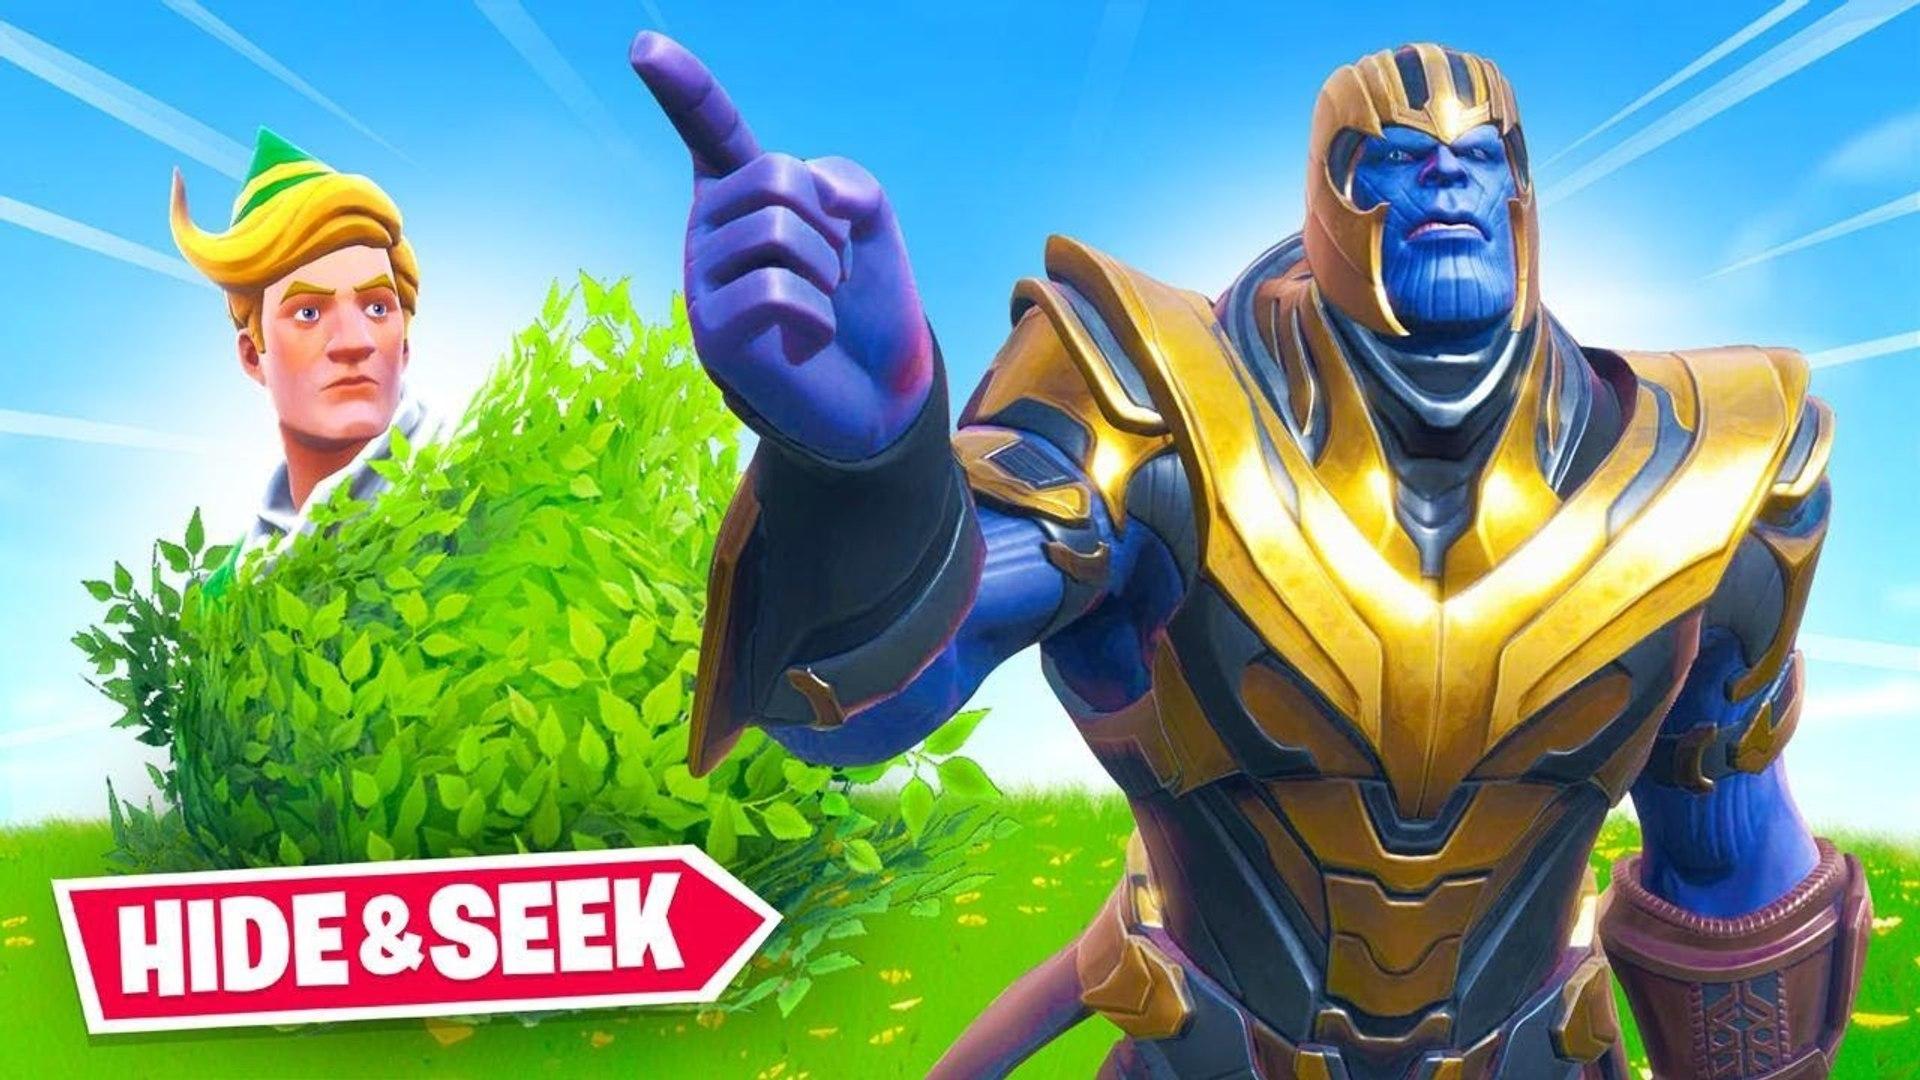 Thanos HIDE & SEEK In Fortnite | Fortnite Funny Moments